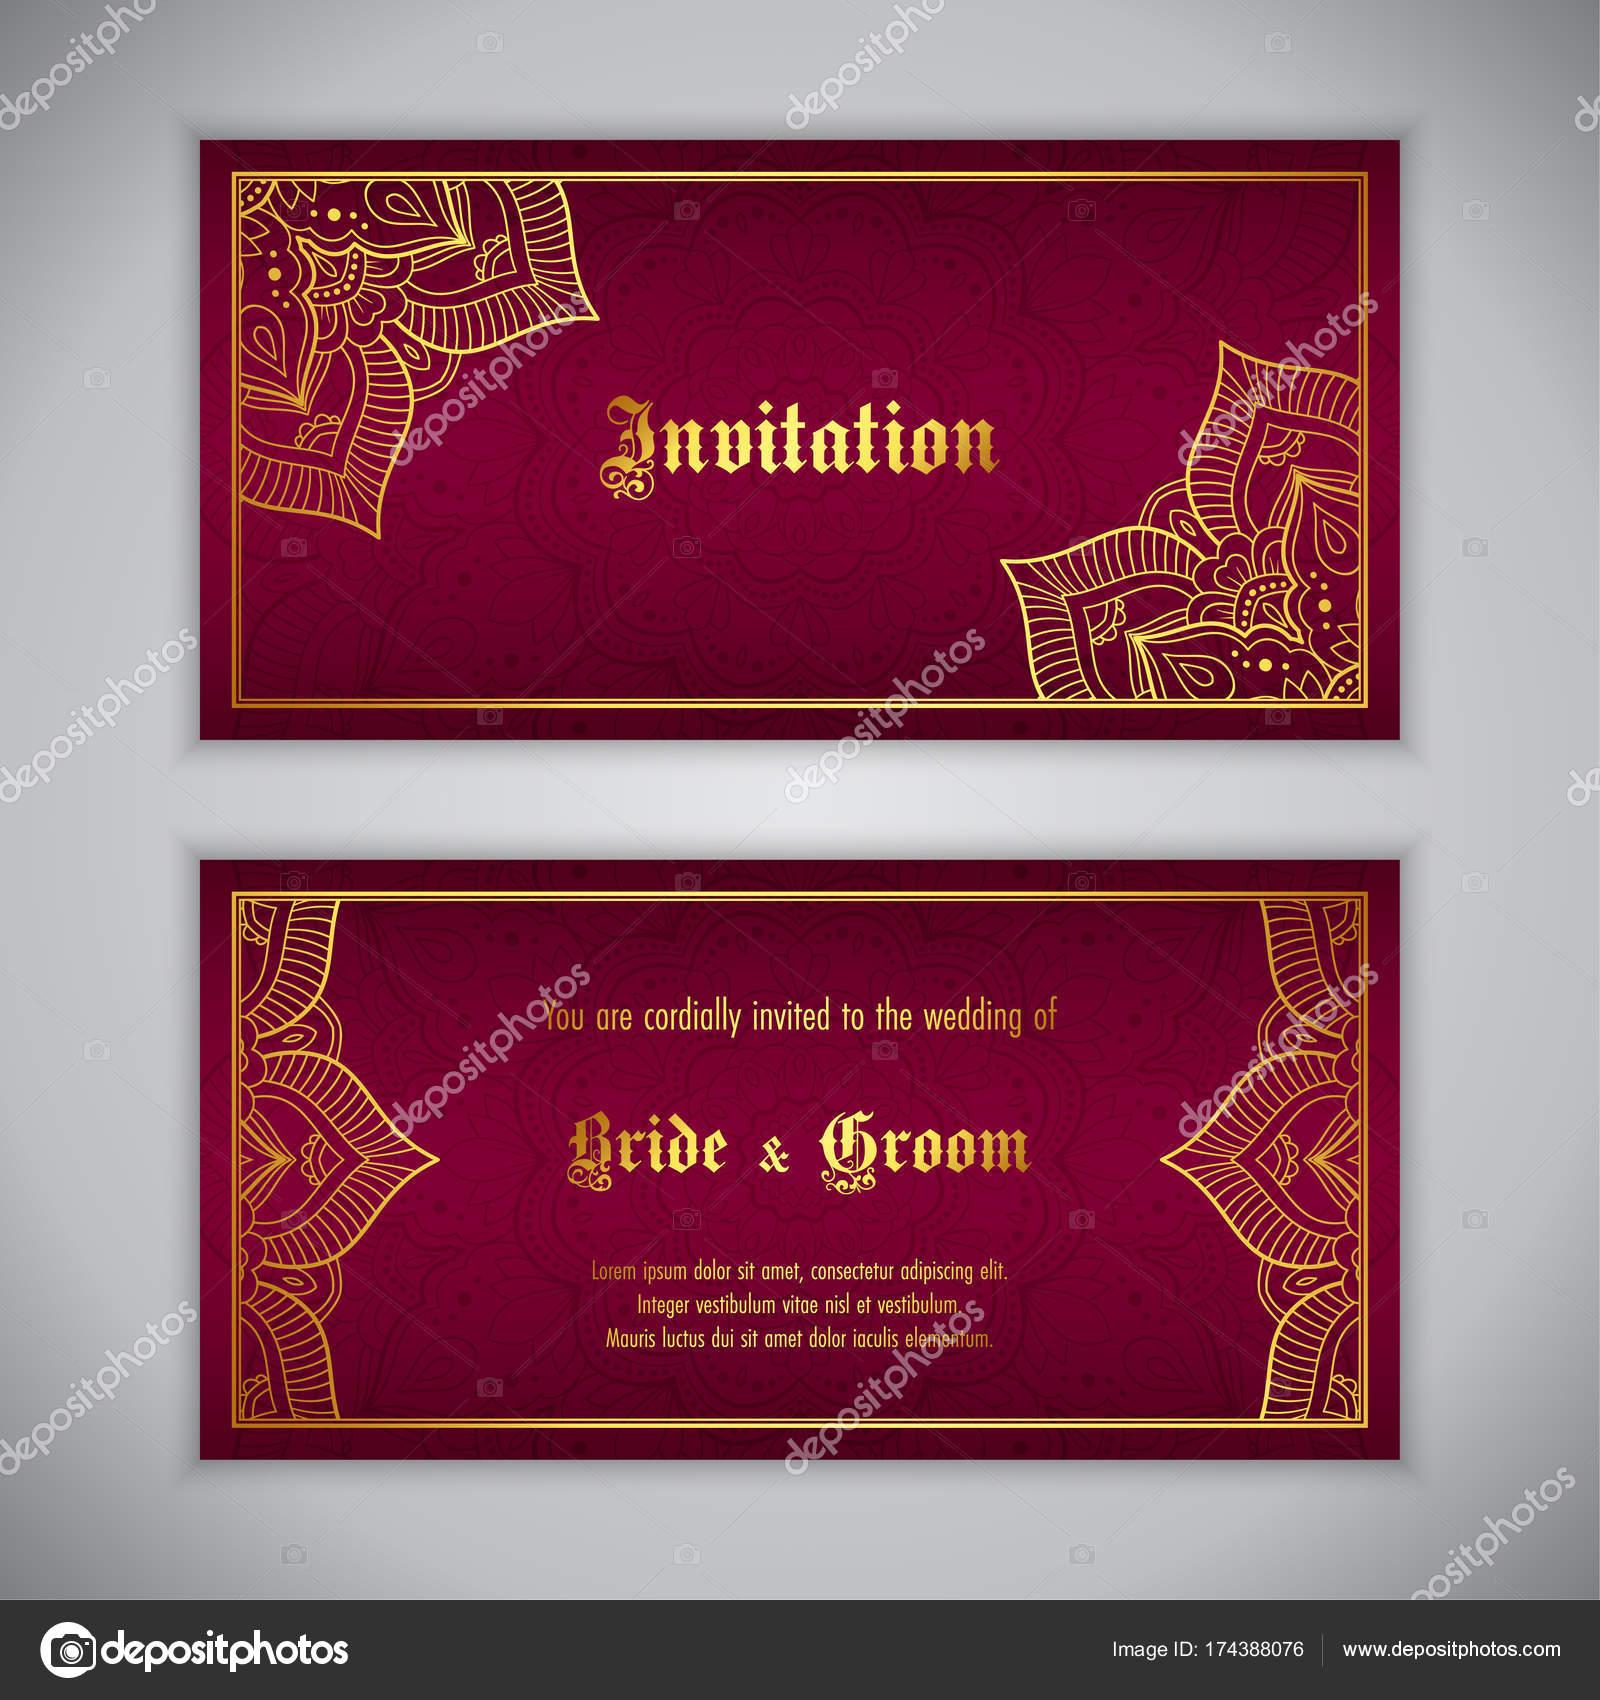 Luxury wedding invitation — Stock Vector © NonikaStar #174388076